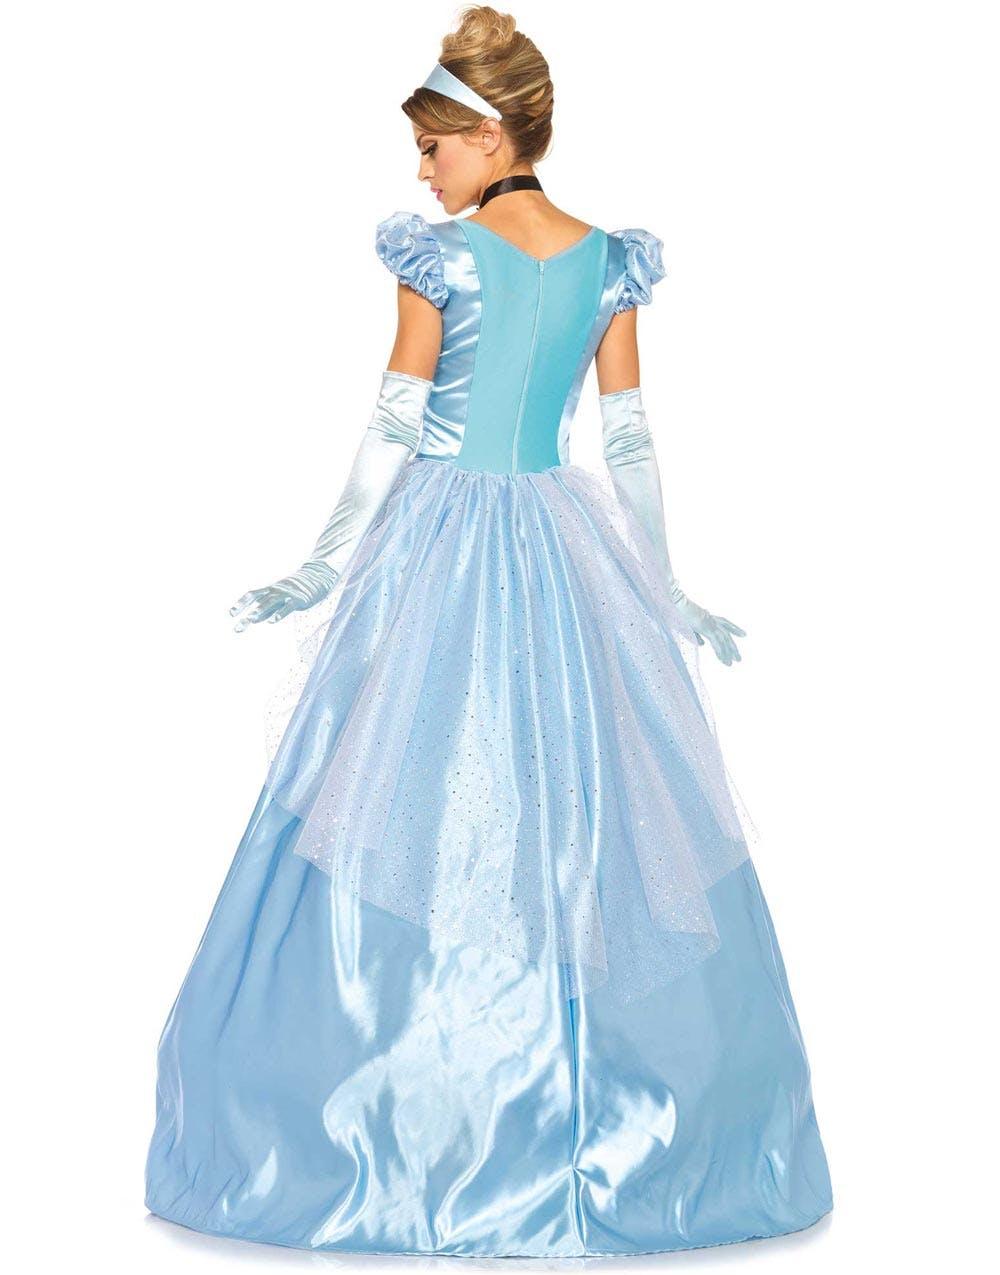 1108315b3 Cinderella - Askepott Luksuskostyme